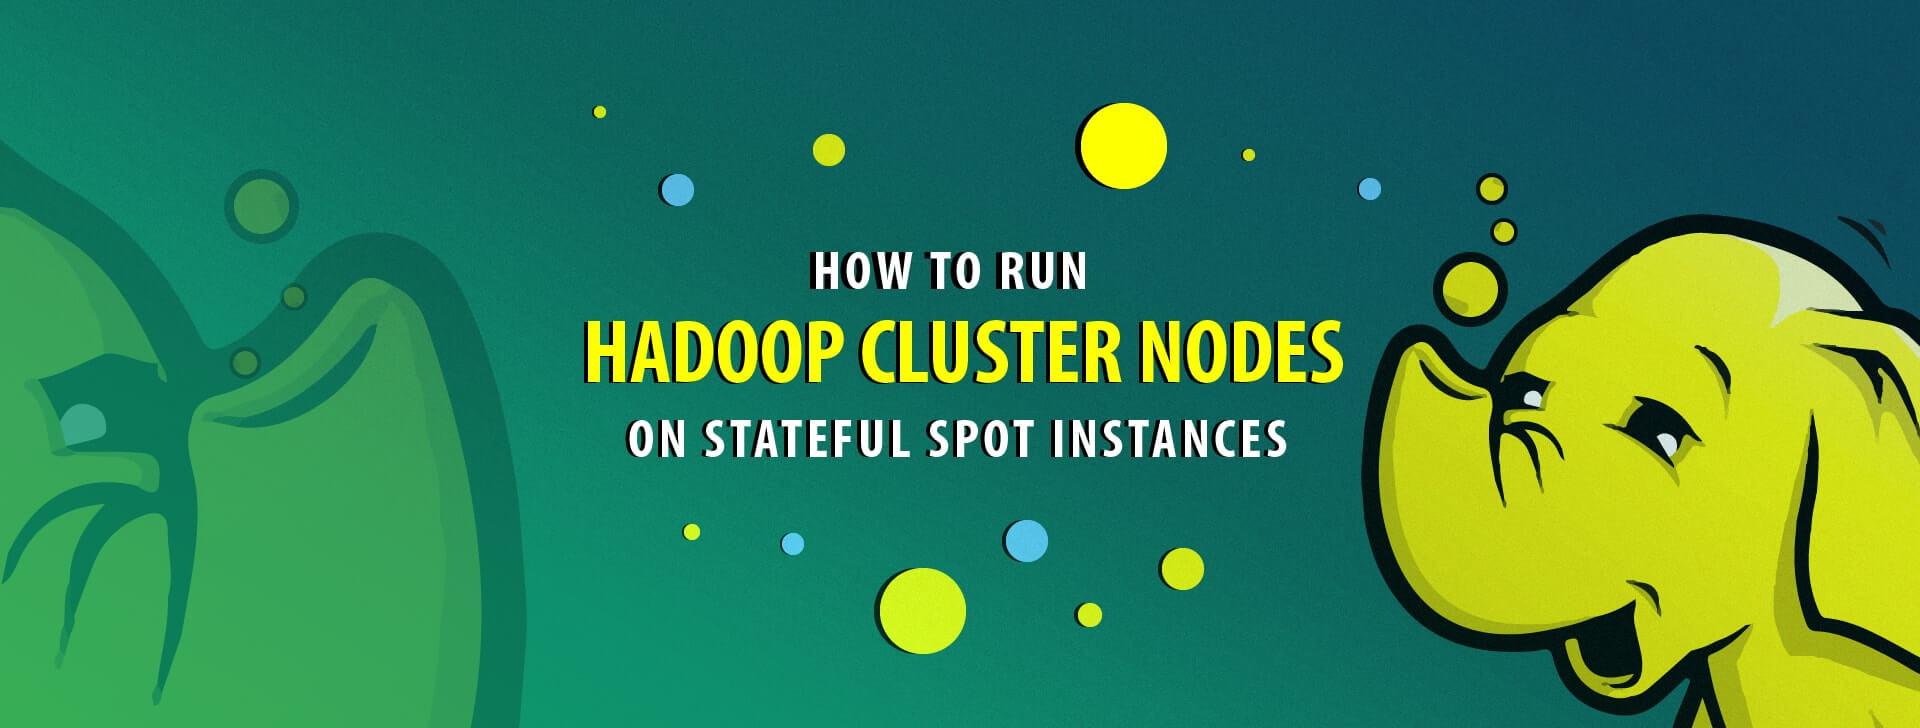 Tutorial: Run Hadoop Cluster Nodes on Stateful Spot Instances